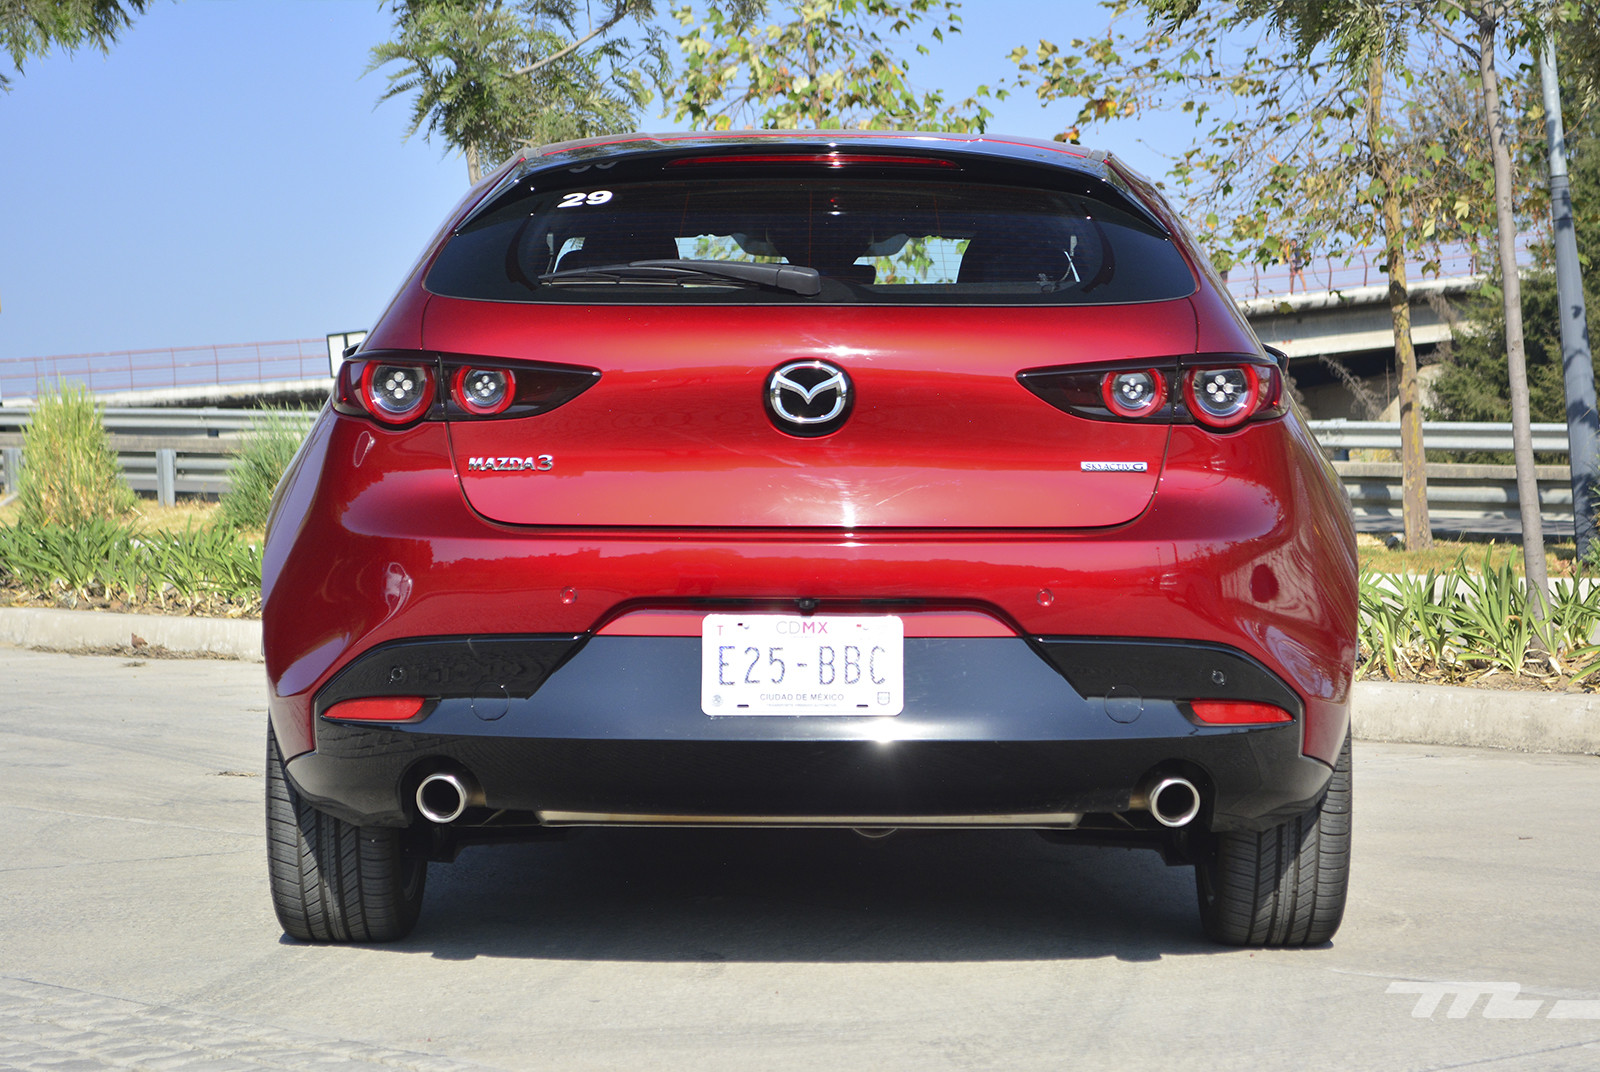 Foto de Mazda 3 vs. SEAT León (comparativa) (13/28)